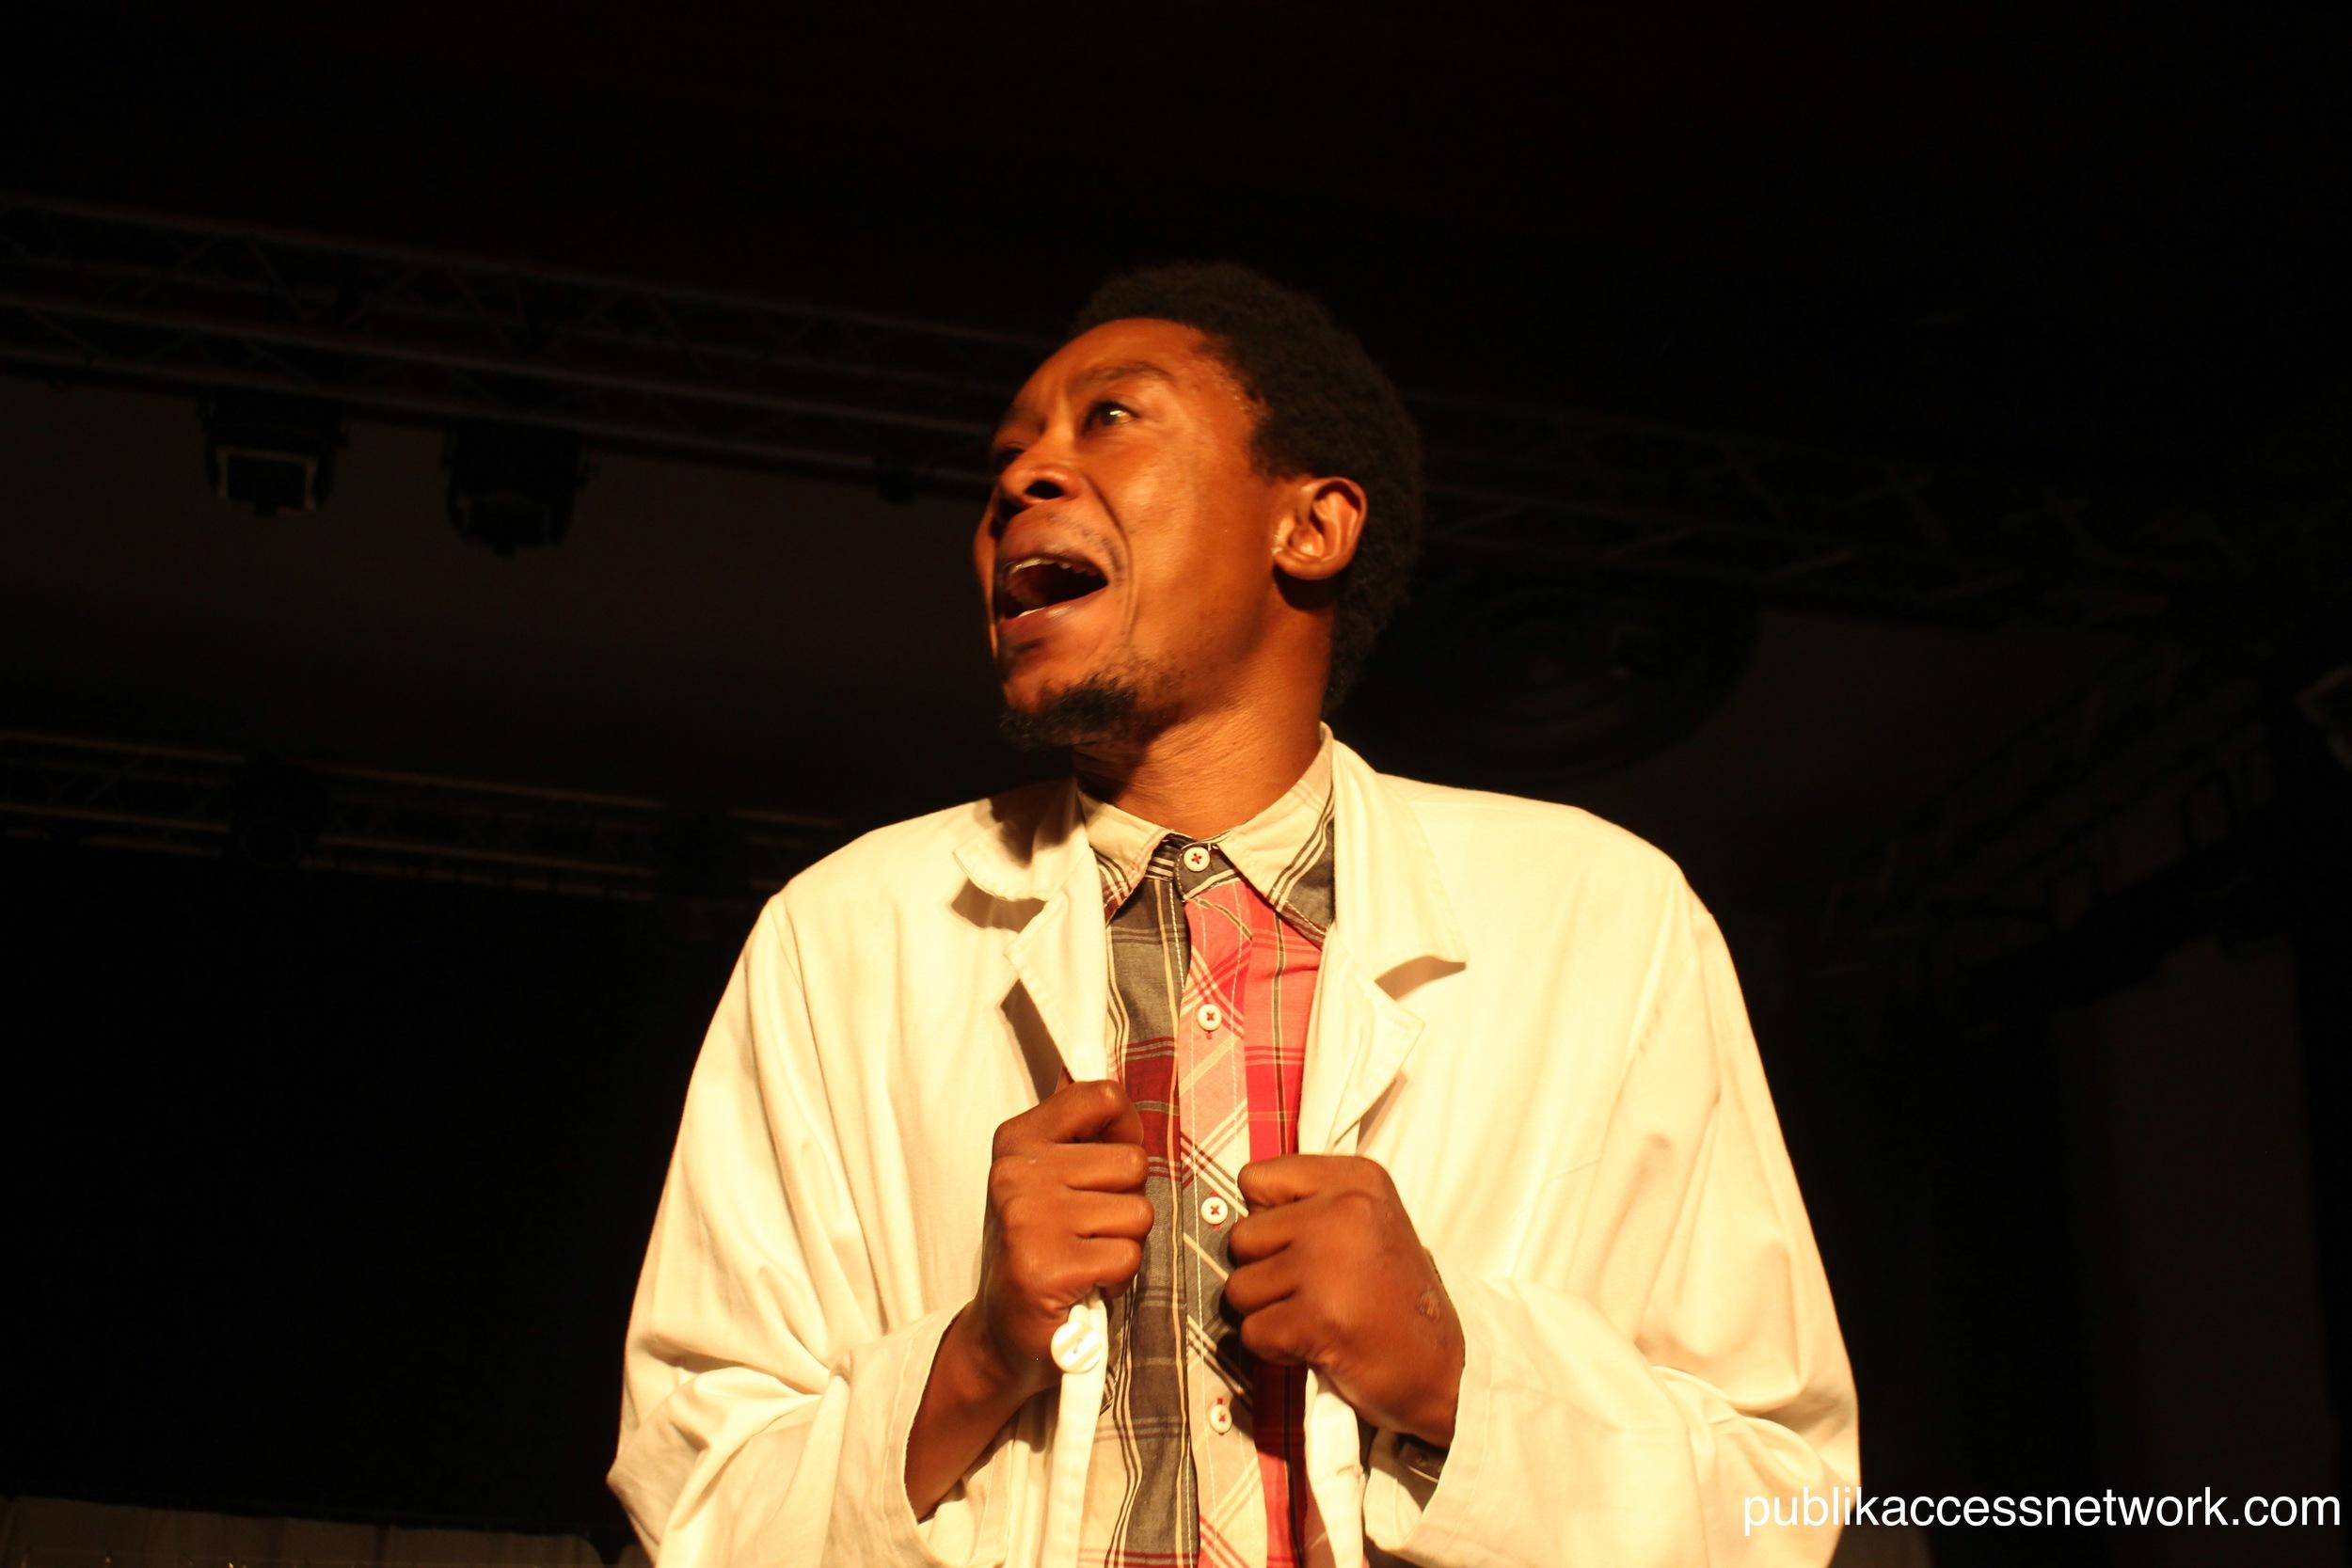 Michael Kudakwashe as seen at Hifa